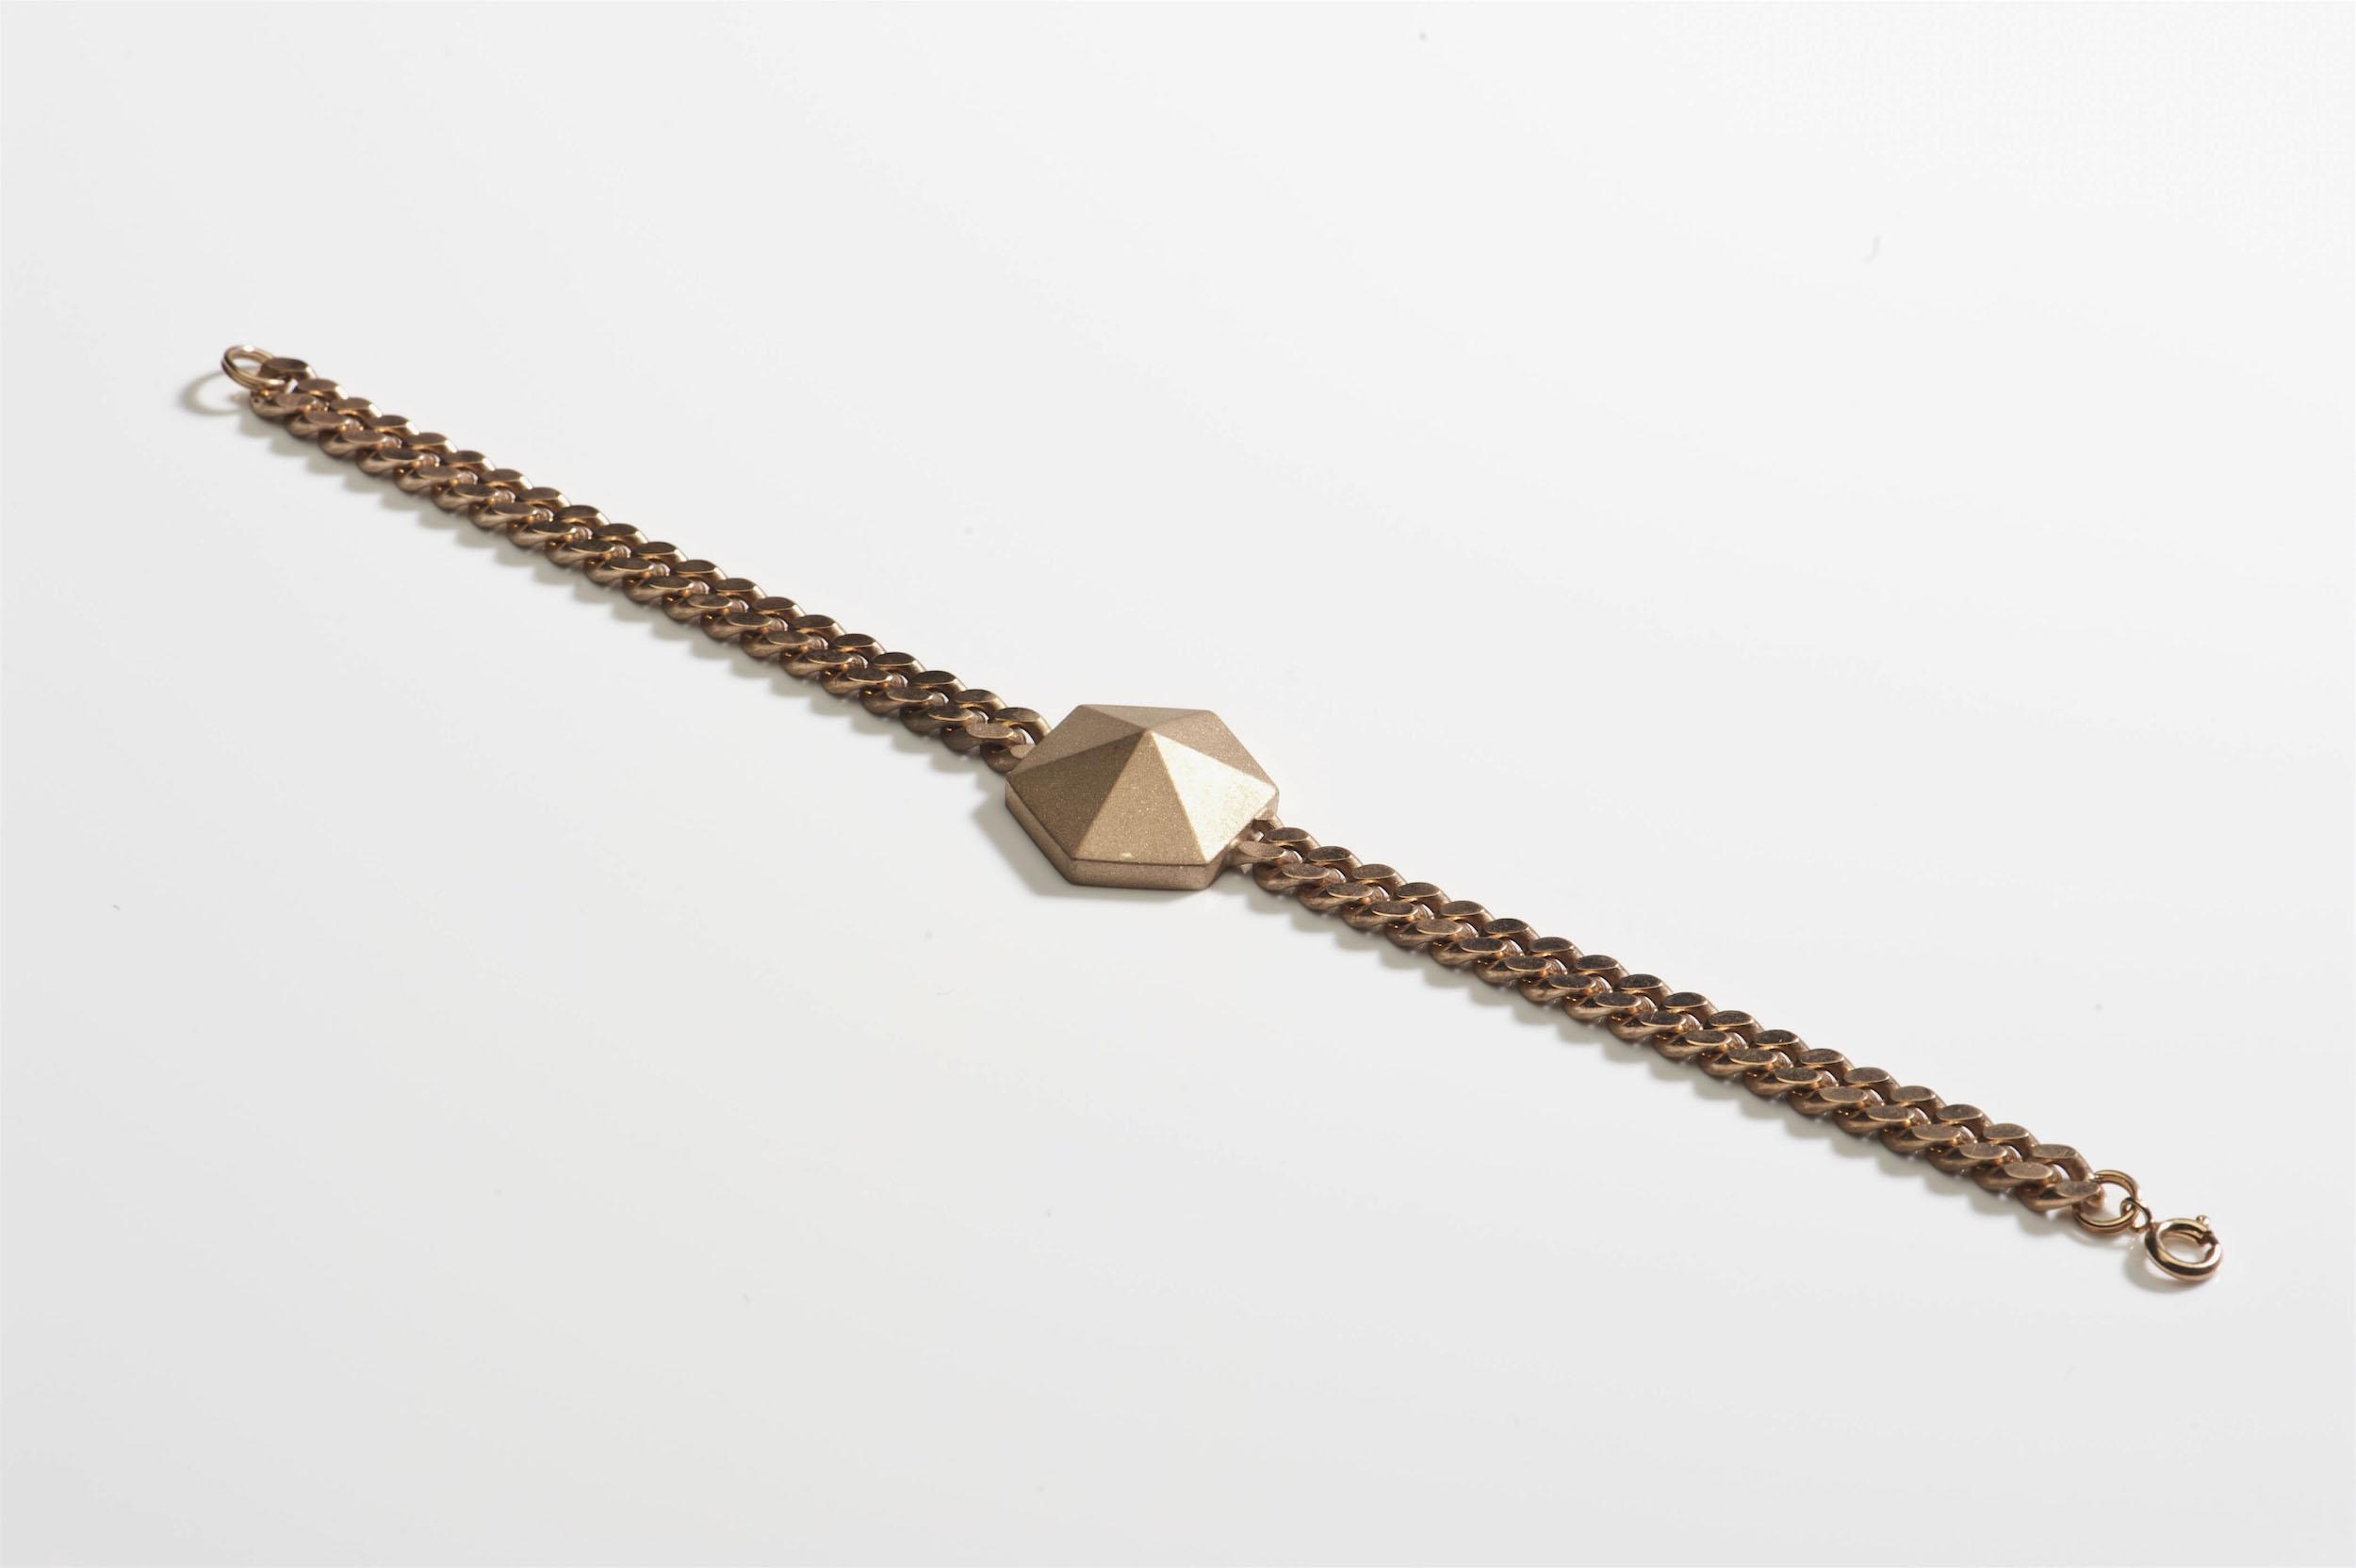 bracelet silver rosegold plated flat curb chain.jpg